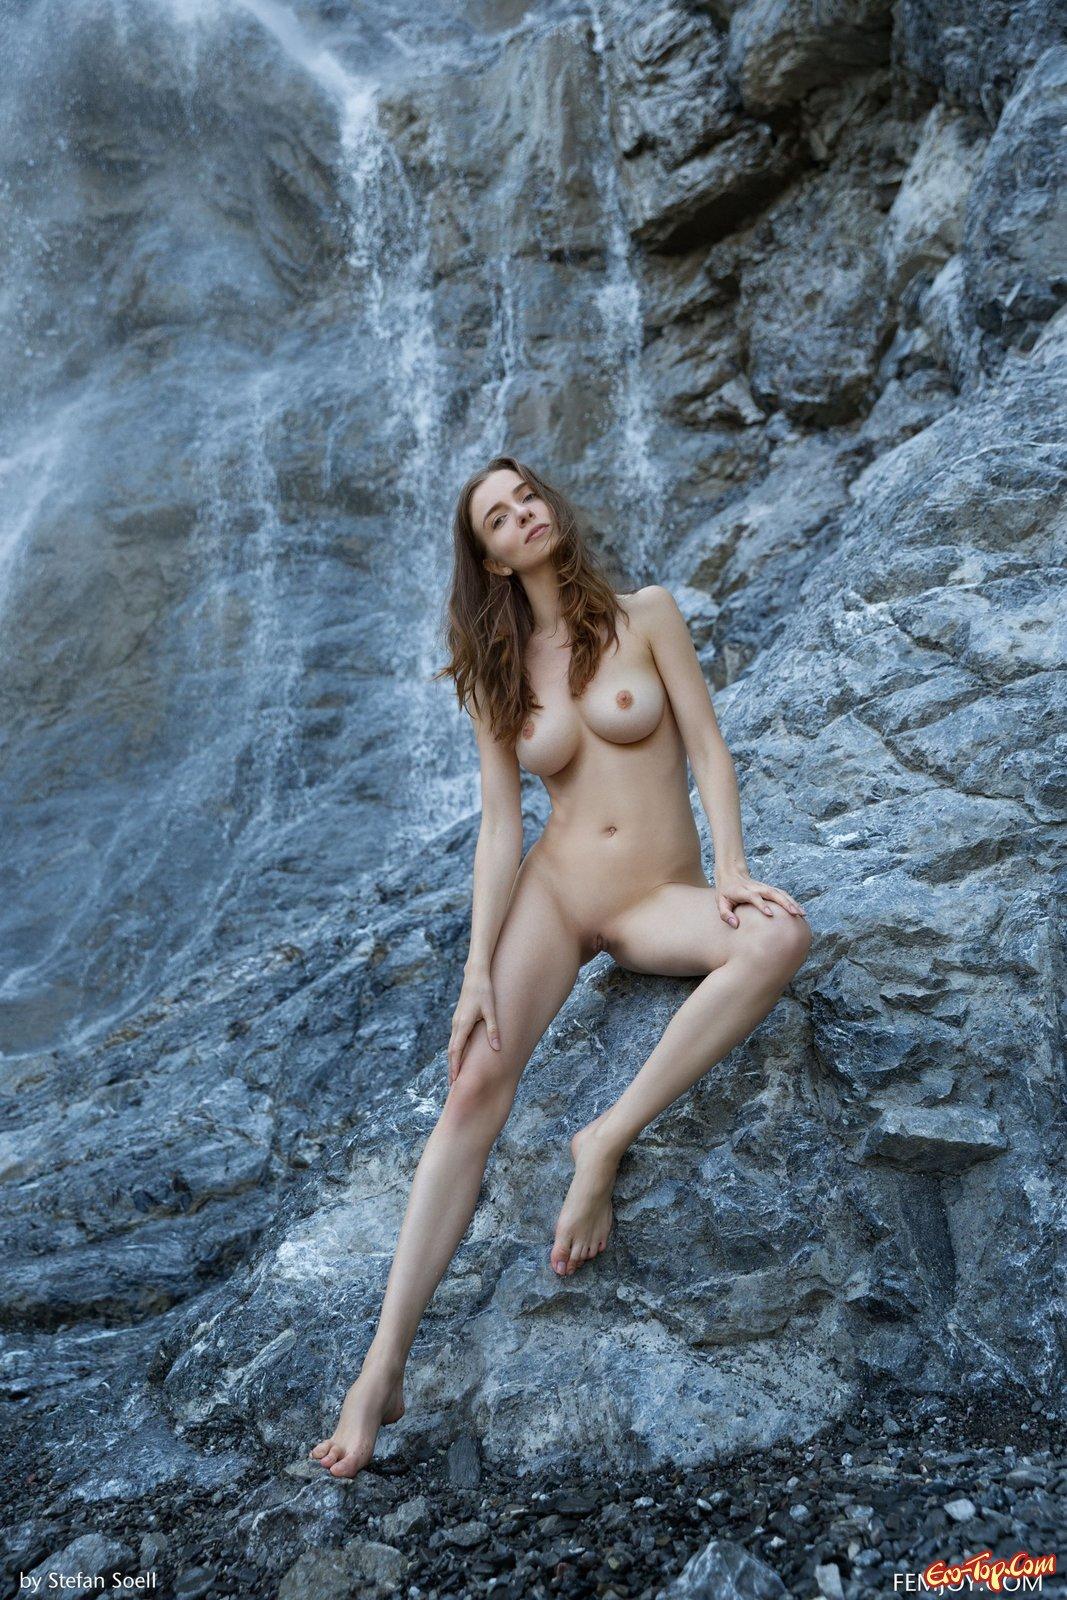 Обнаженная шатенка показала грудь стоя у водопада